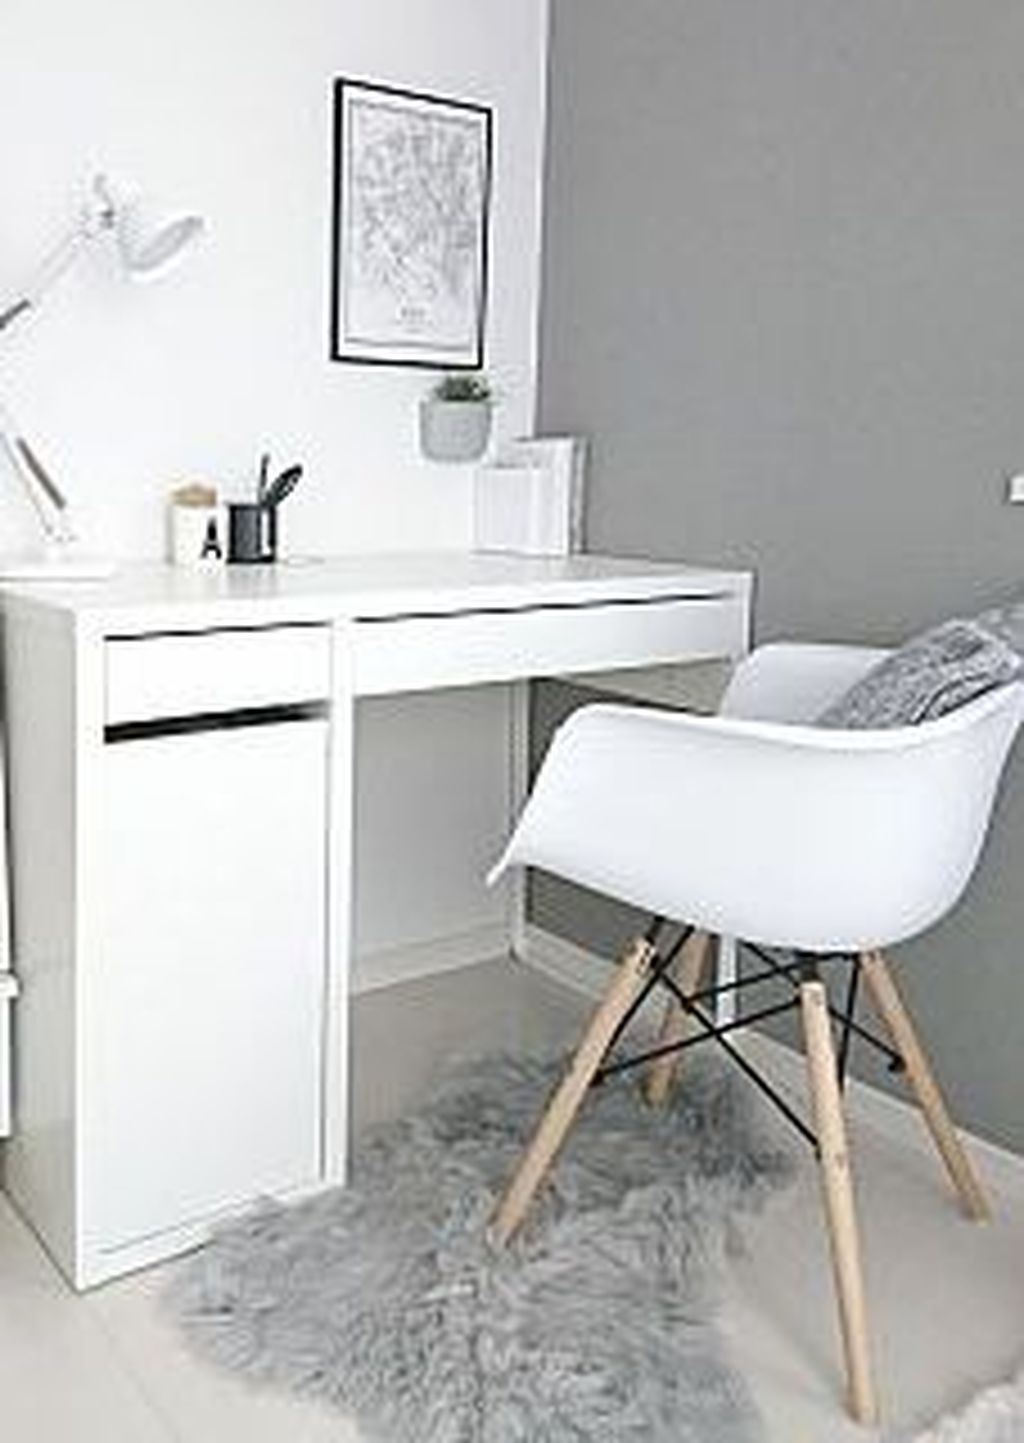 Nice 33 Stunning Workspace Design Ideas With Ikea Micke Desk That